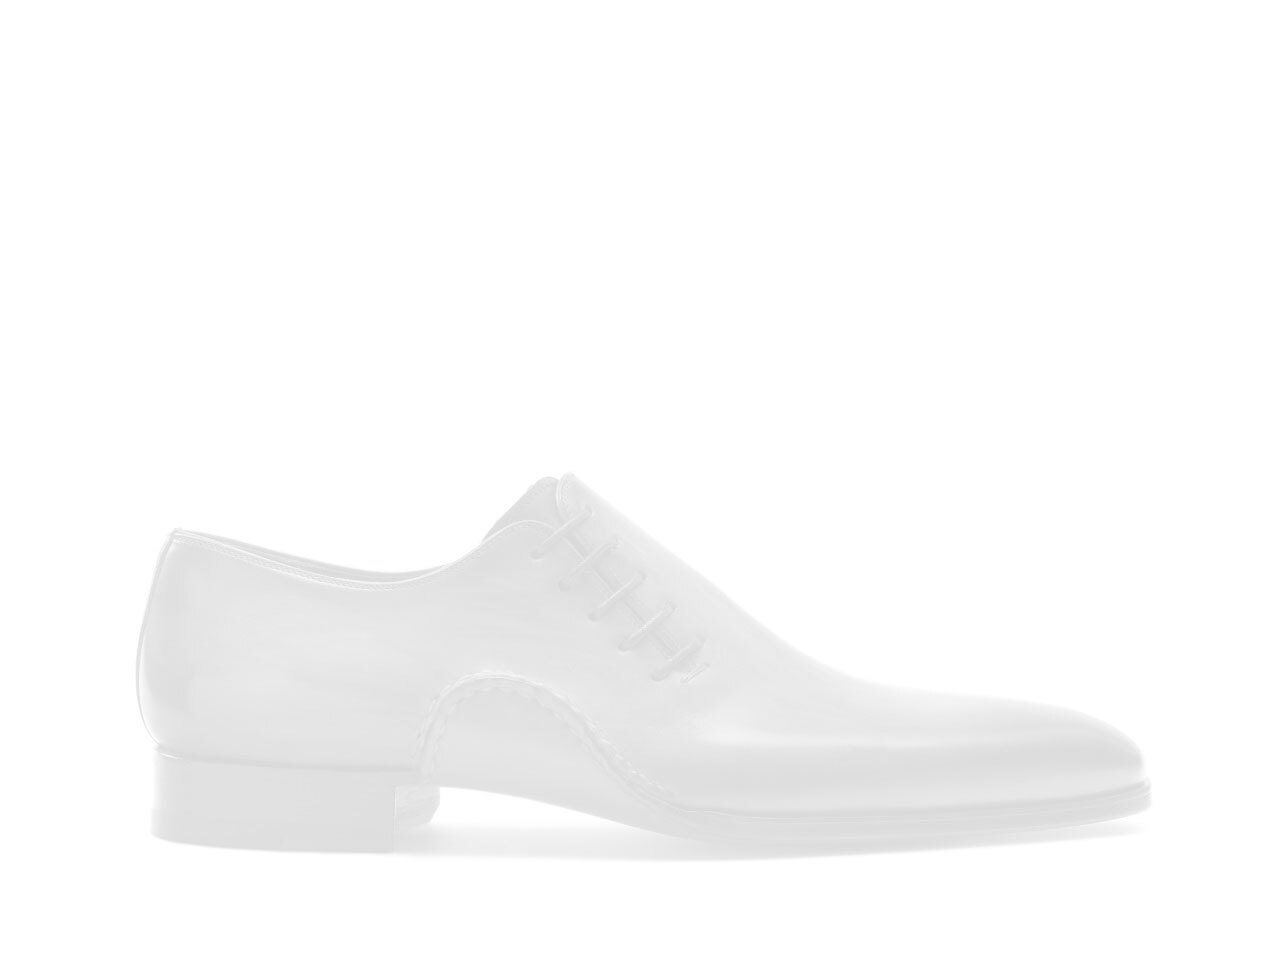 Sole of the Magnanni Saffron Cuero Wide Men's Oxford Shoes